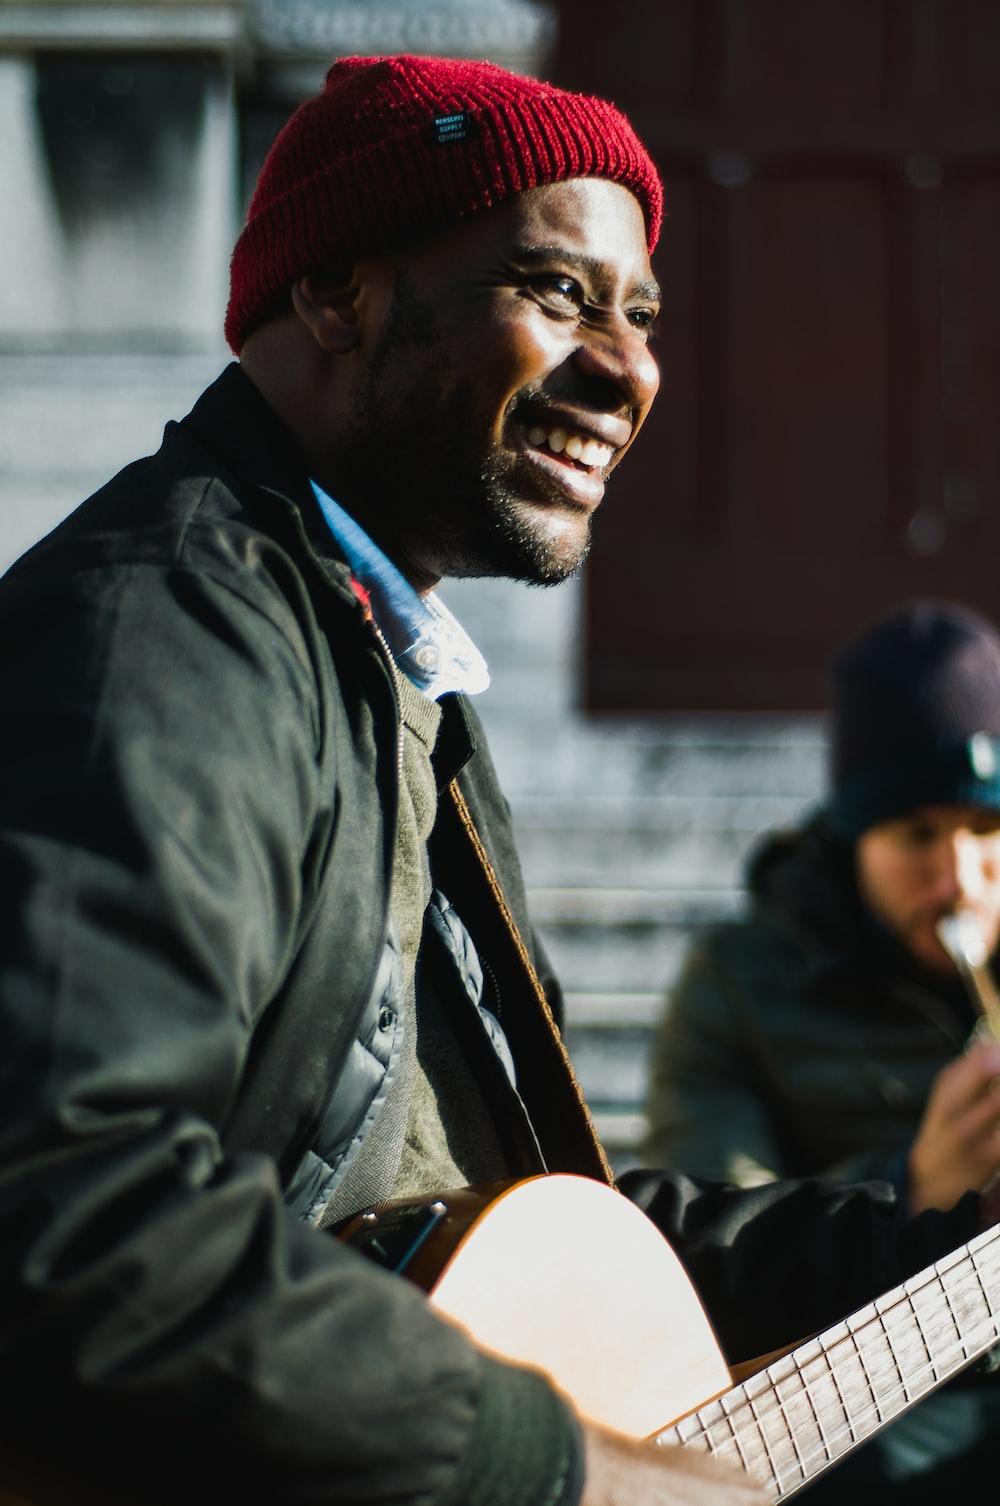 man holding guitar near man playing flute